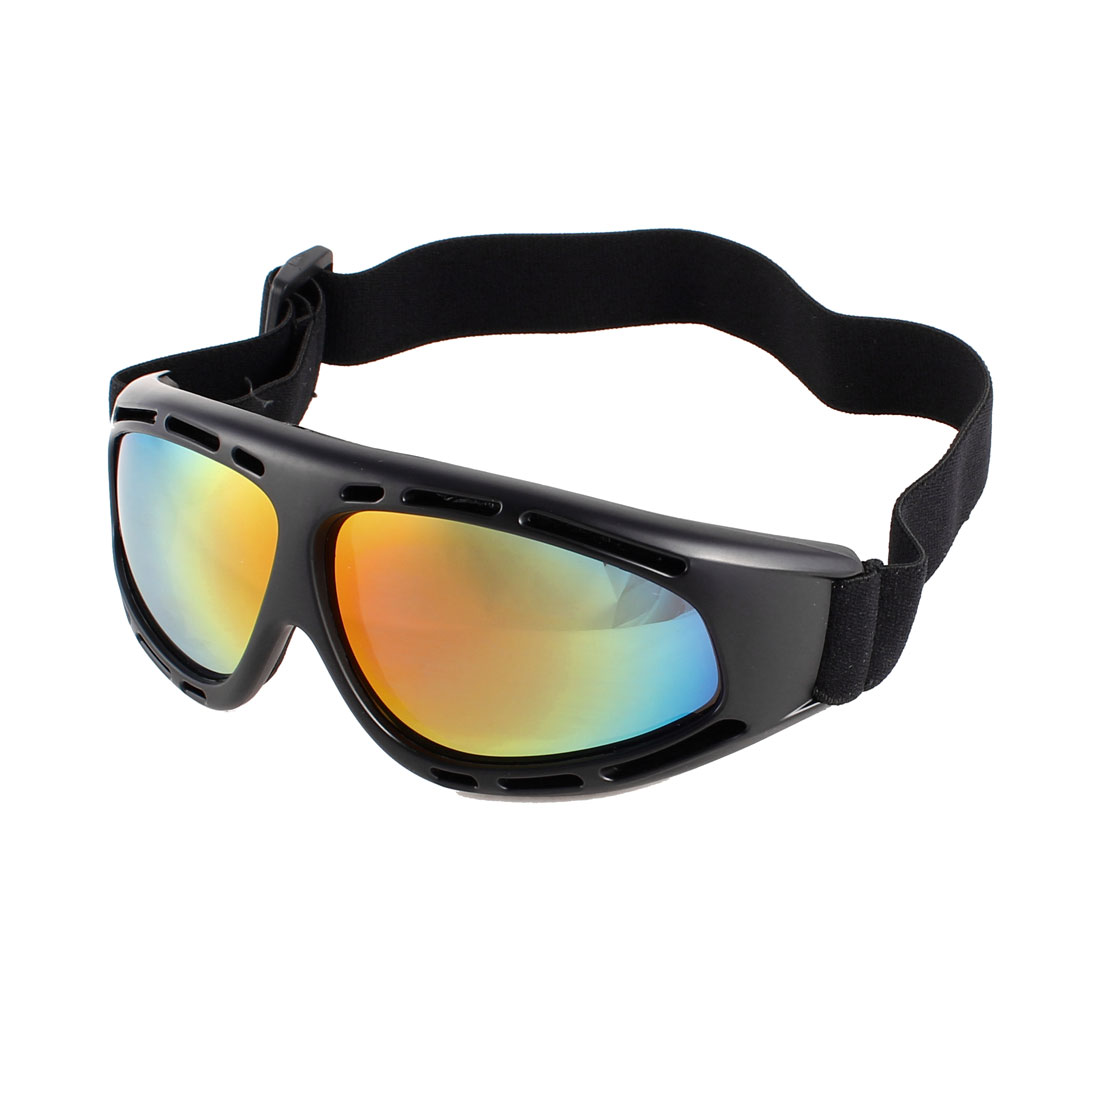 Full Rim Colors Lens Elastic Strap Ski Snowboard Sports Goggles Sunglasses